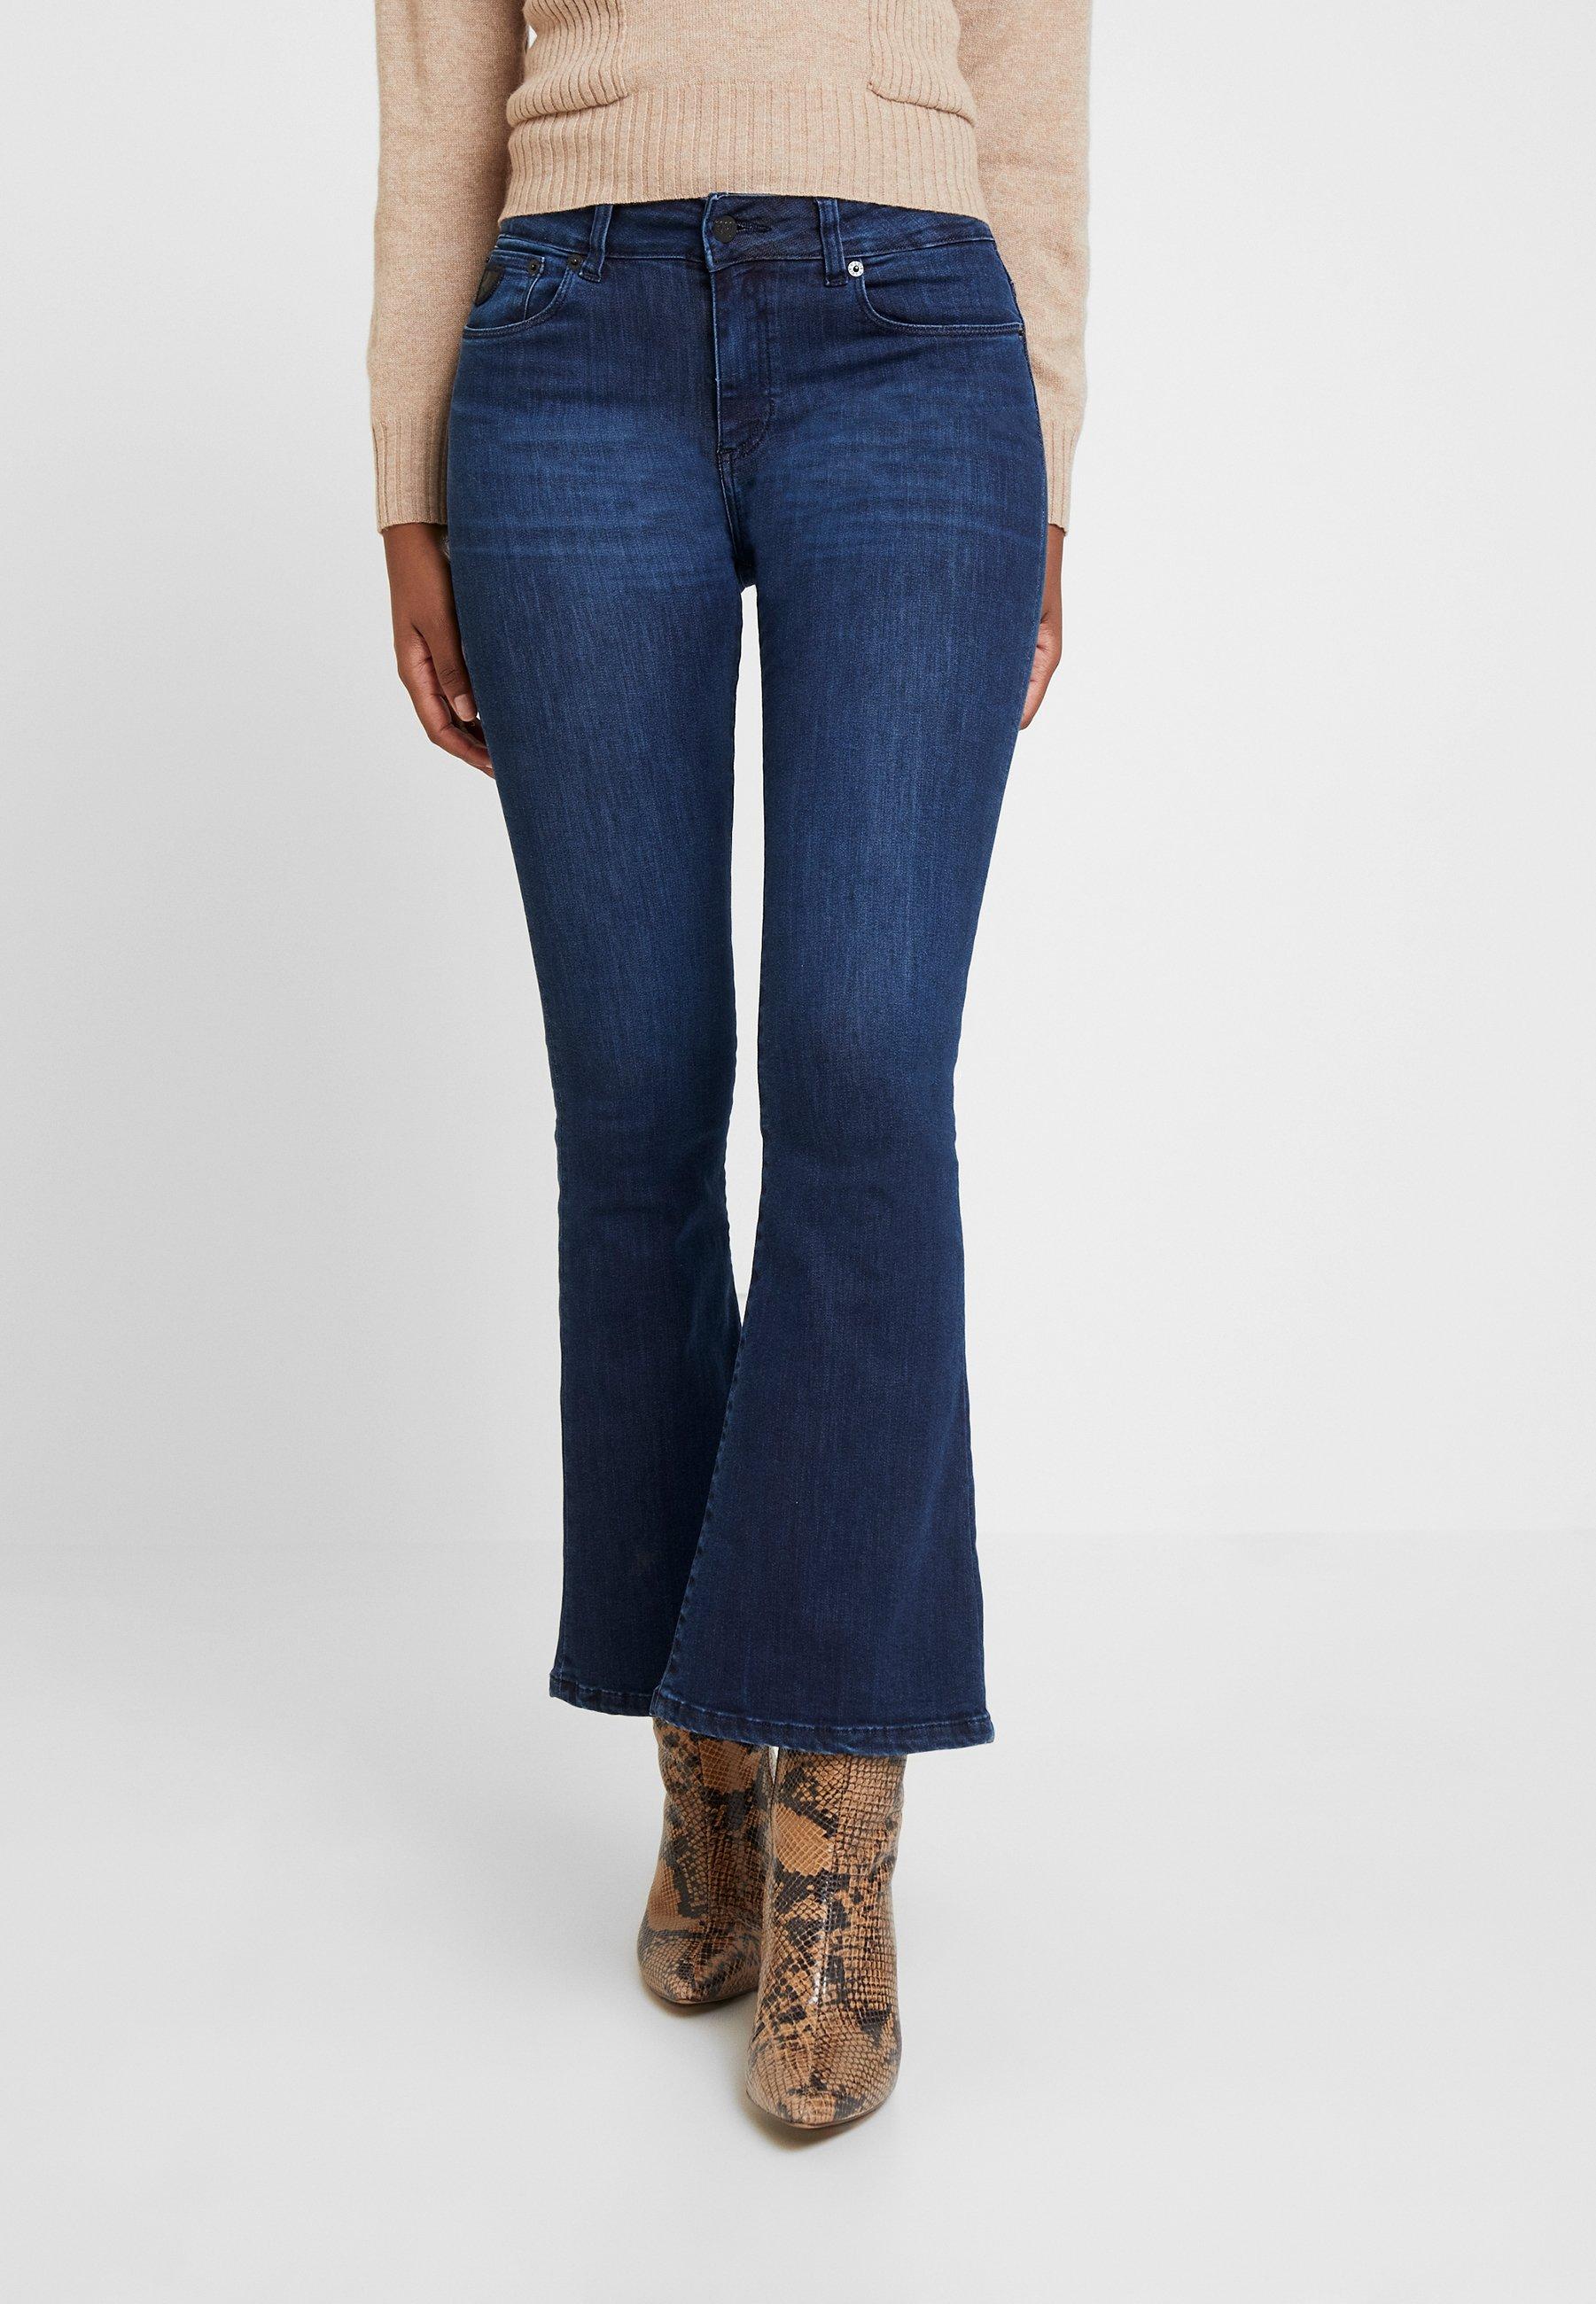 Jeans Denim Flare Dark blue Lois RavalJean 0XPnw8Ok